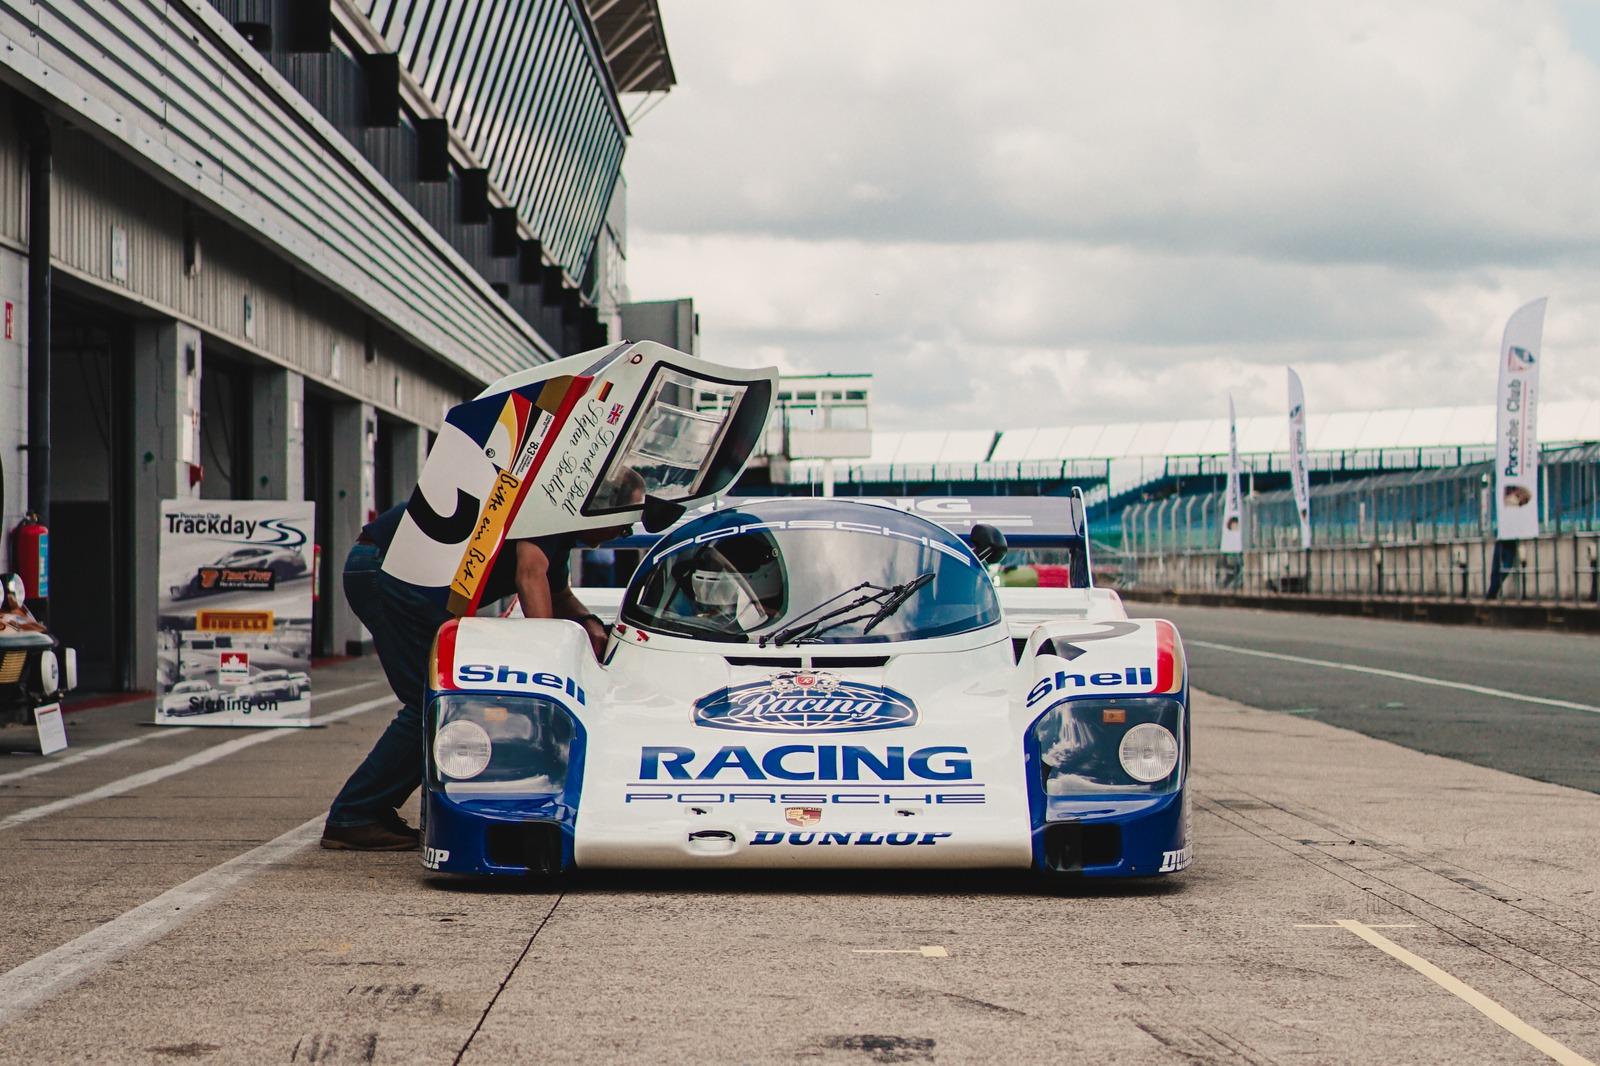 Silverstone Track Day with Porsche Club Great Britain